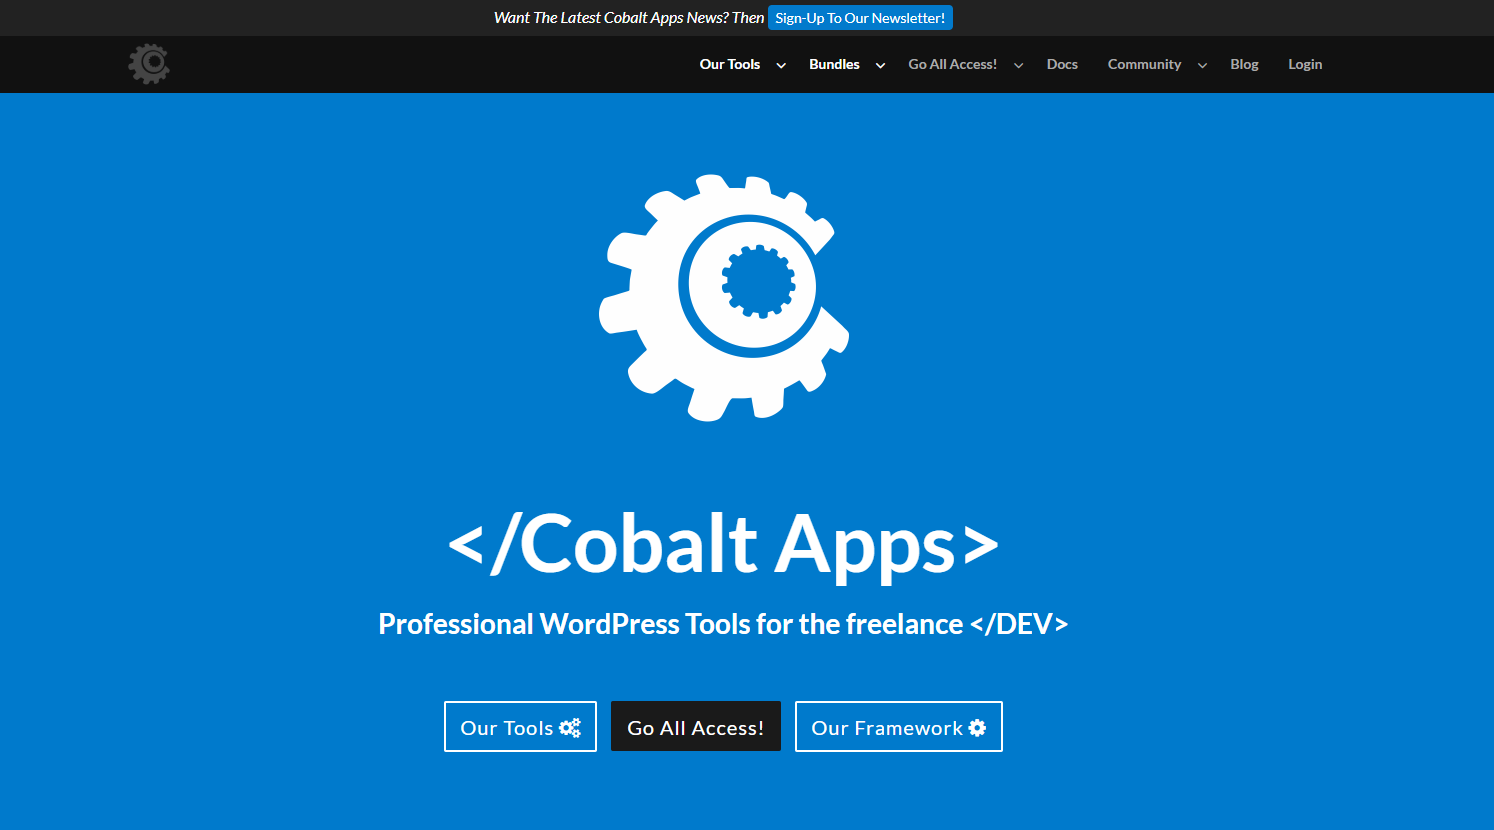 Cobalt Apps Review- Premium Tools For The Freelance WordPress Developer